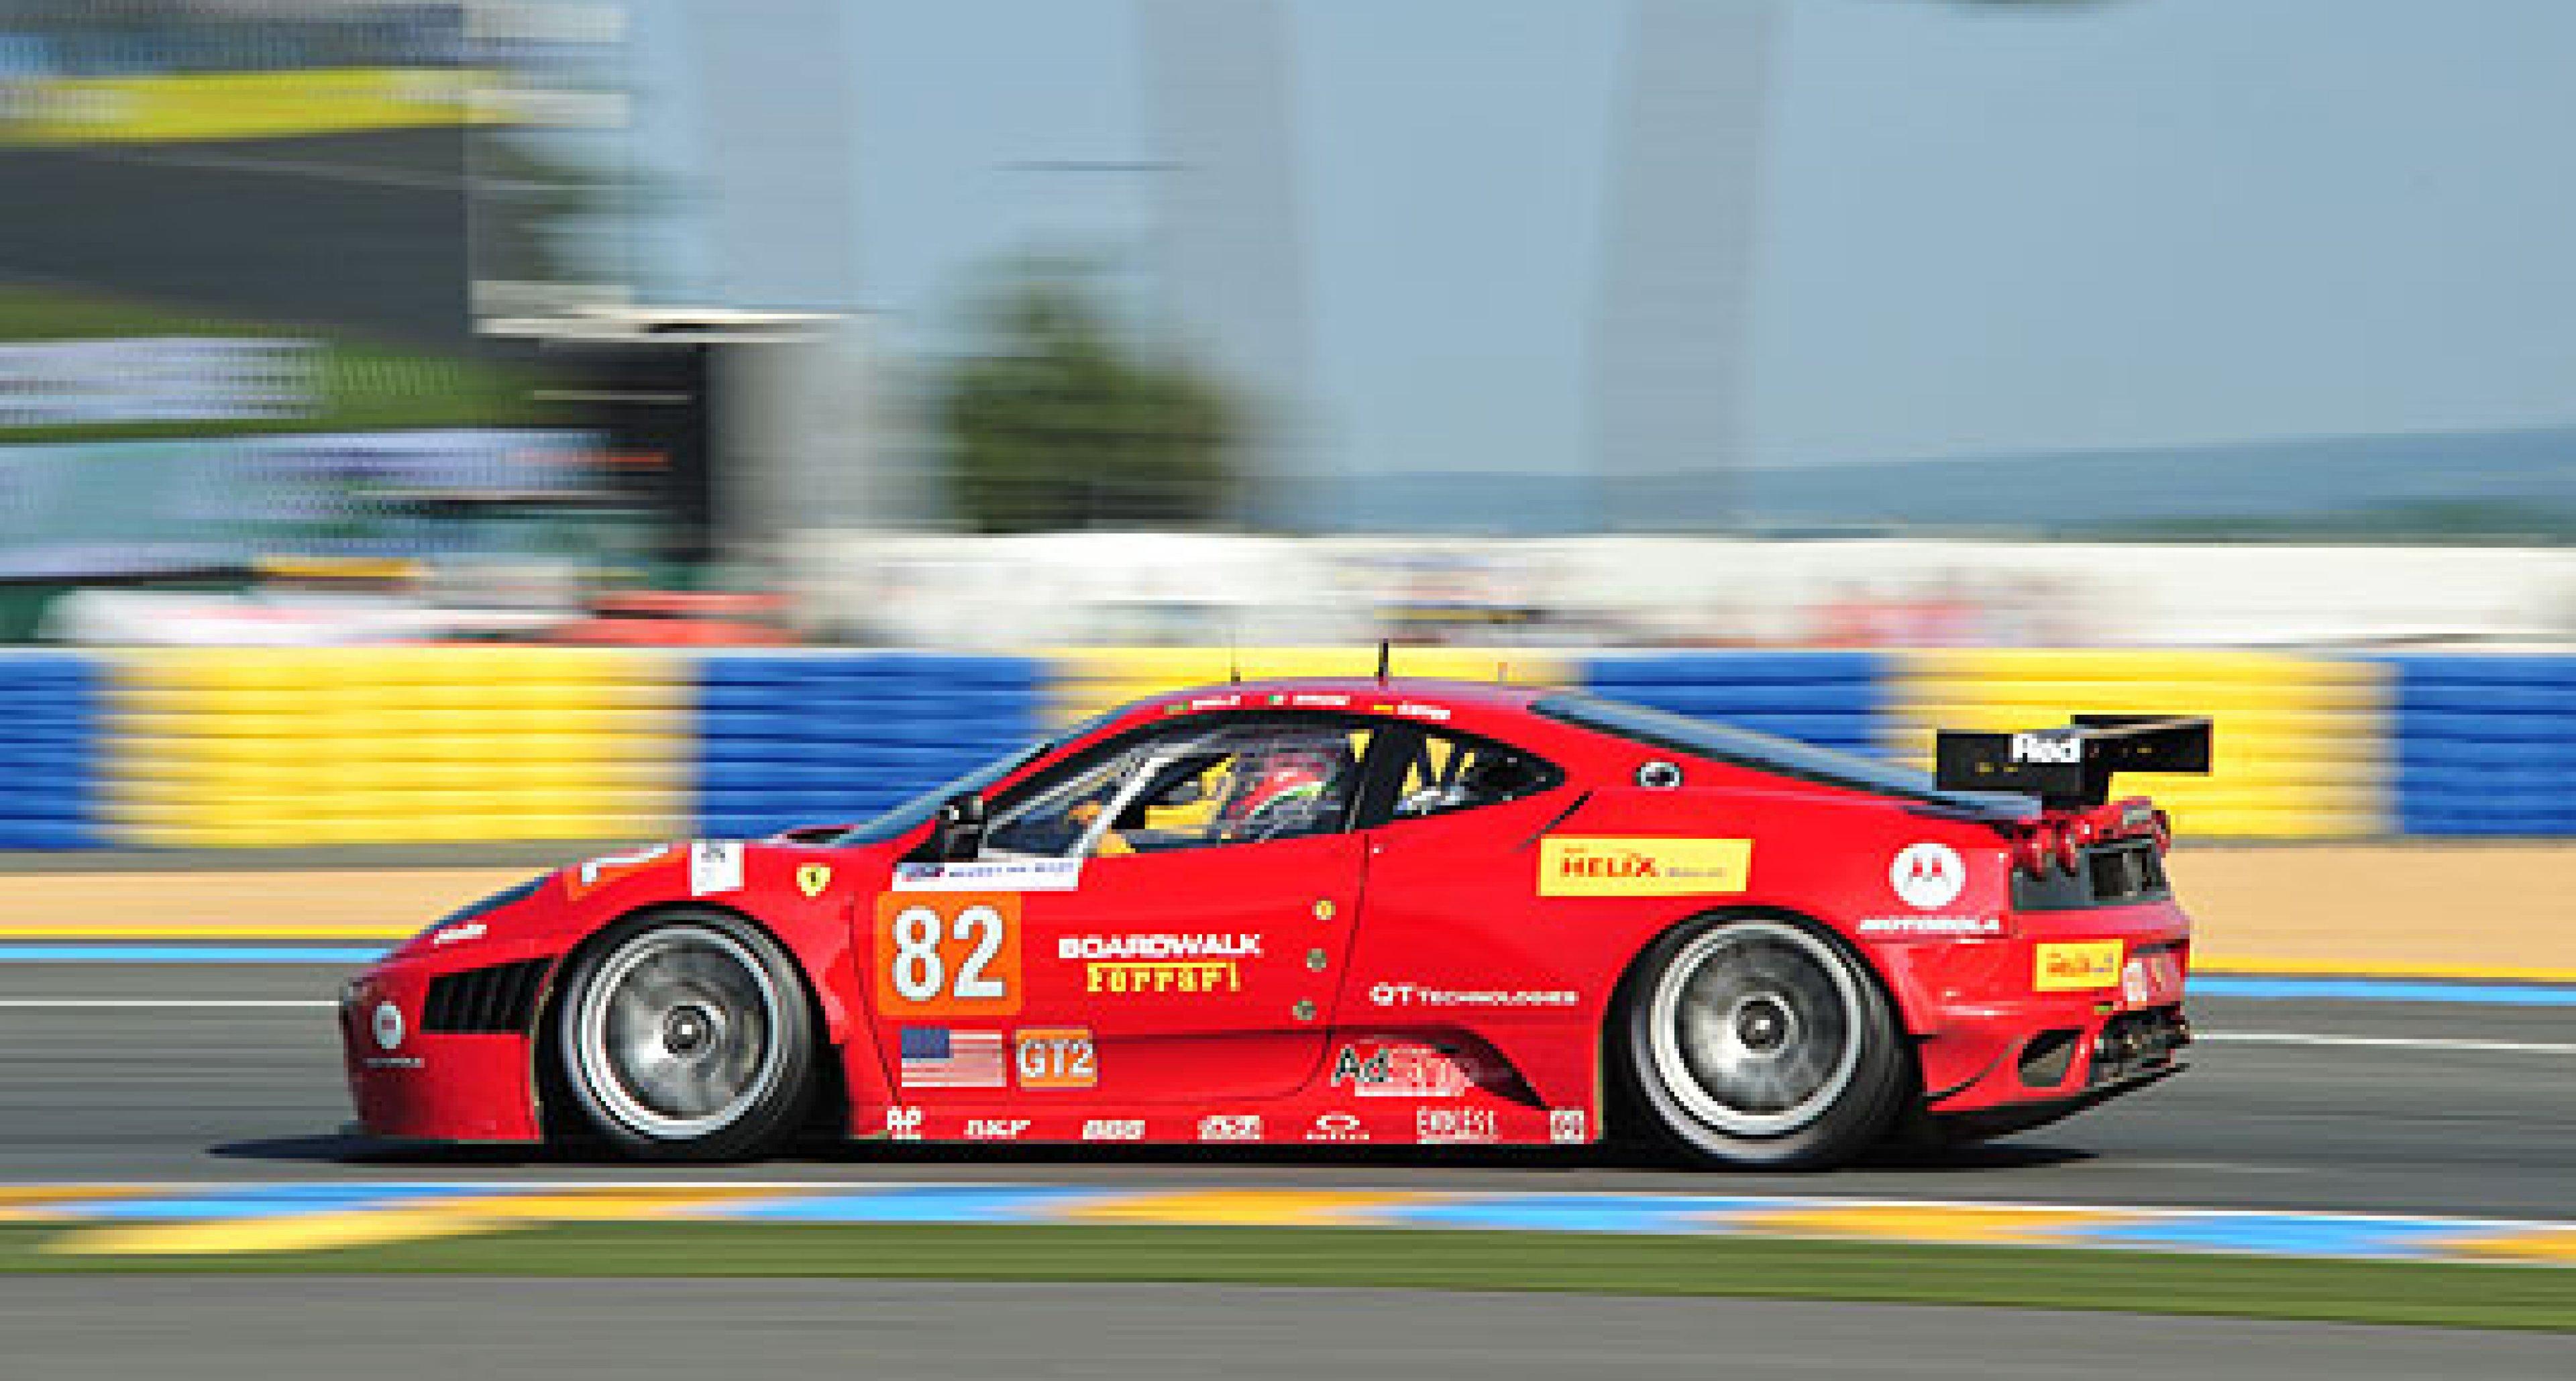 The 2010 Le Mans 24 Hours: 1, 2, 3 for Audi – Heartbreak for Peugeot